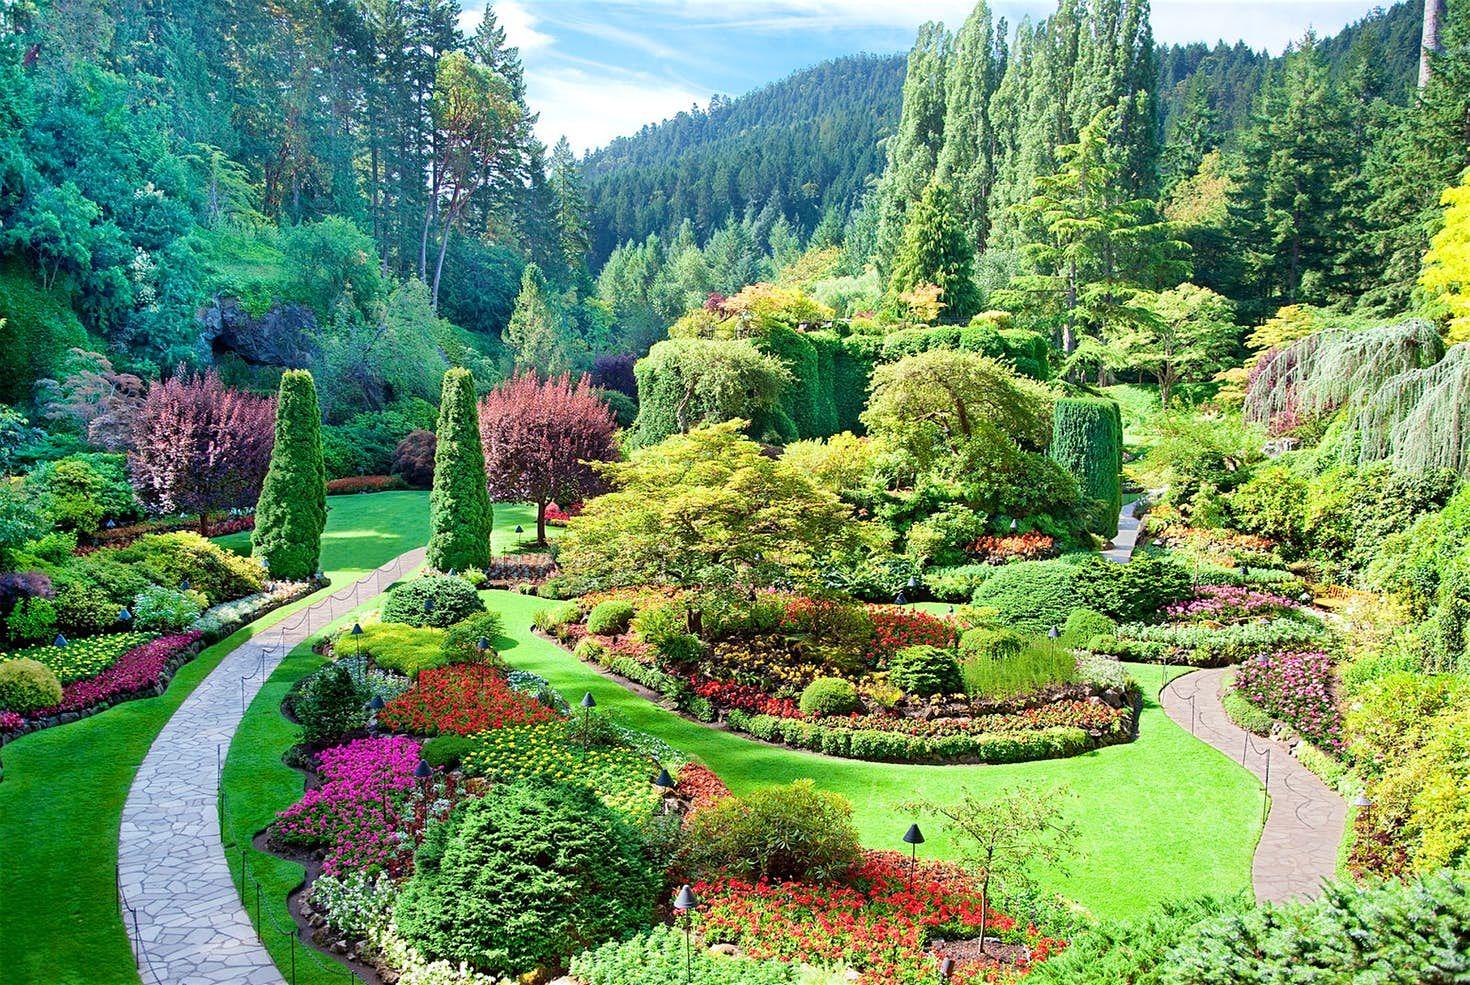 88ba808f837181a310878a6fe8ab1d8d - Names Of Gardens In The World